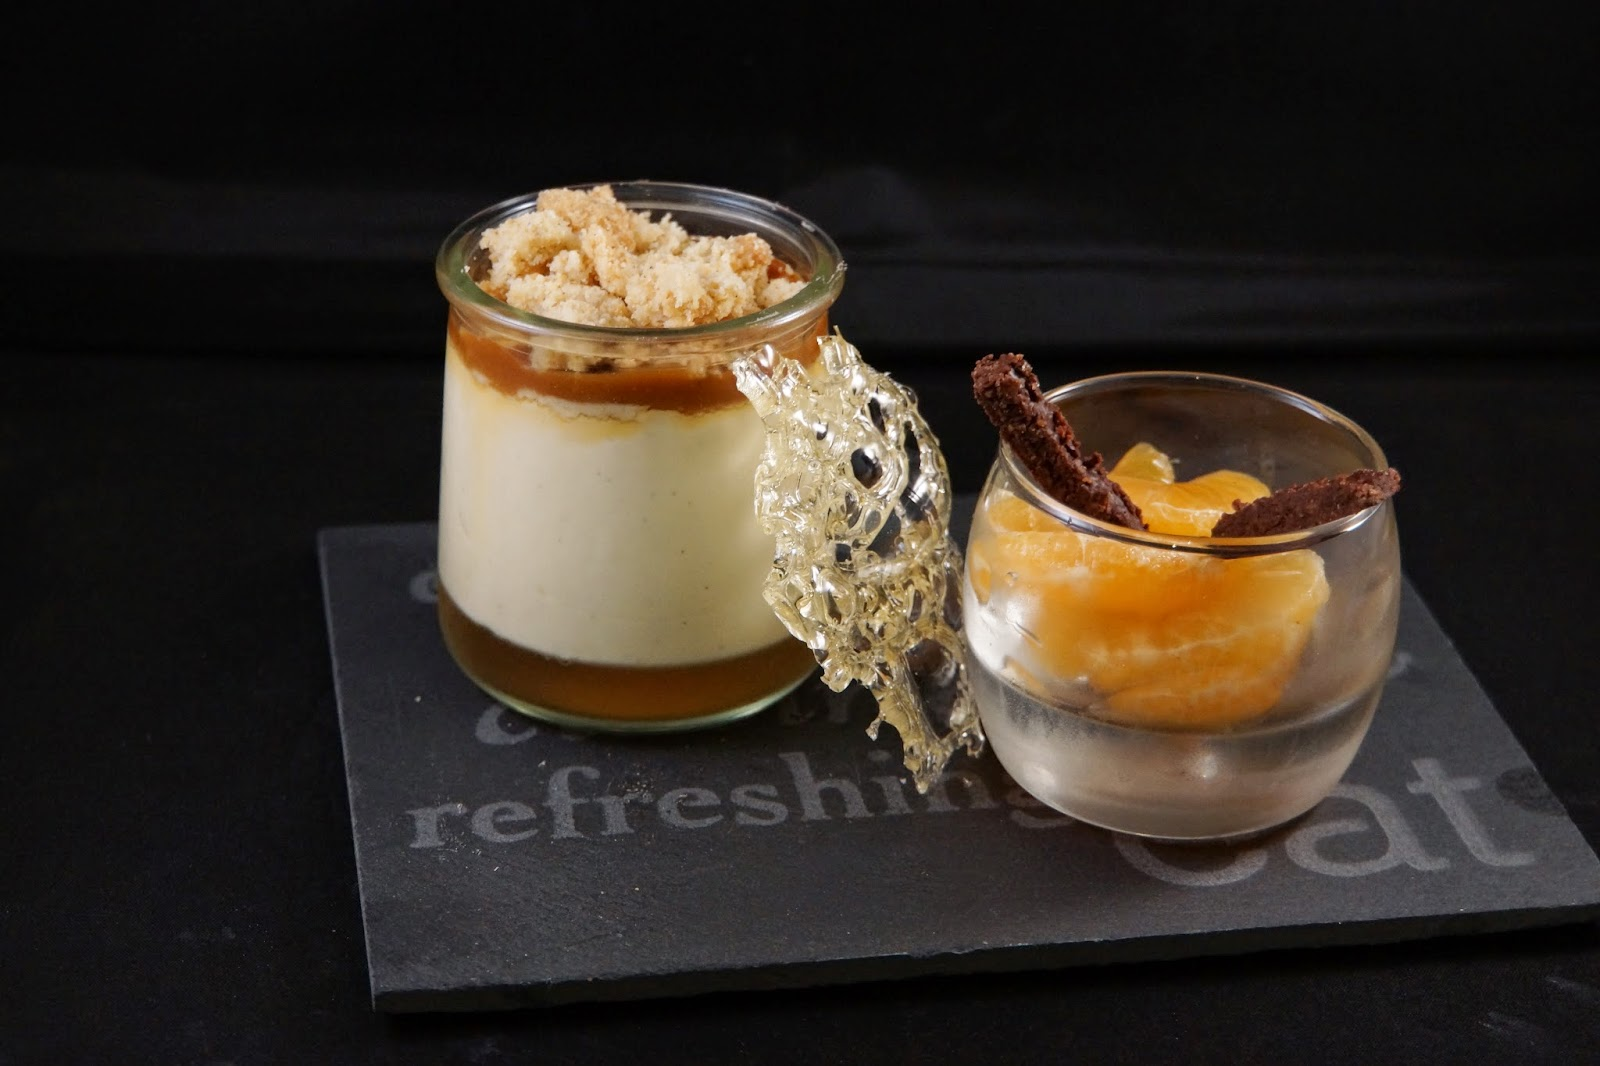 un brin de gourmandise verrine de cr me diplomate vanille pineau et caramel au beurre sal. Black Bedroom Furniture Sets. Home Design Ideas